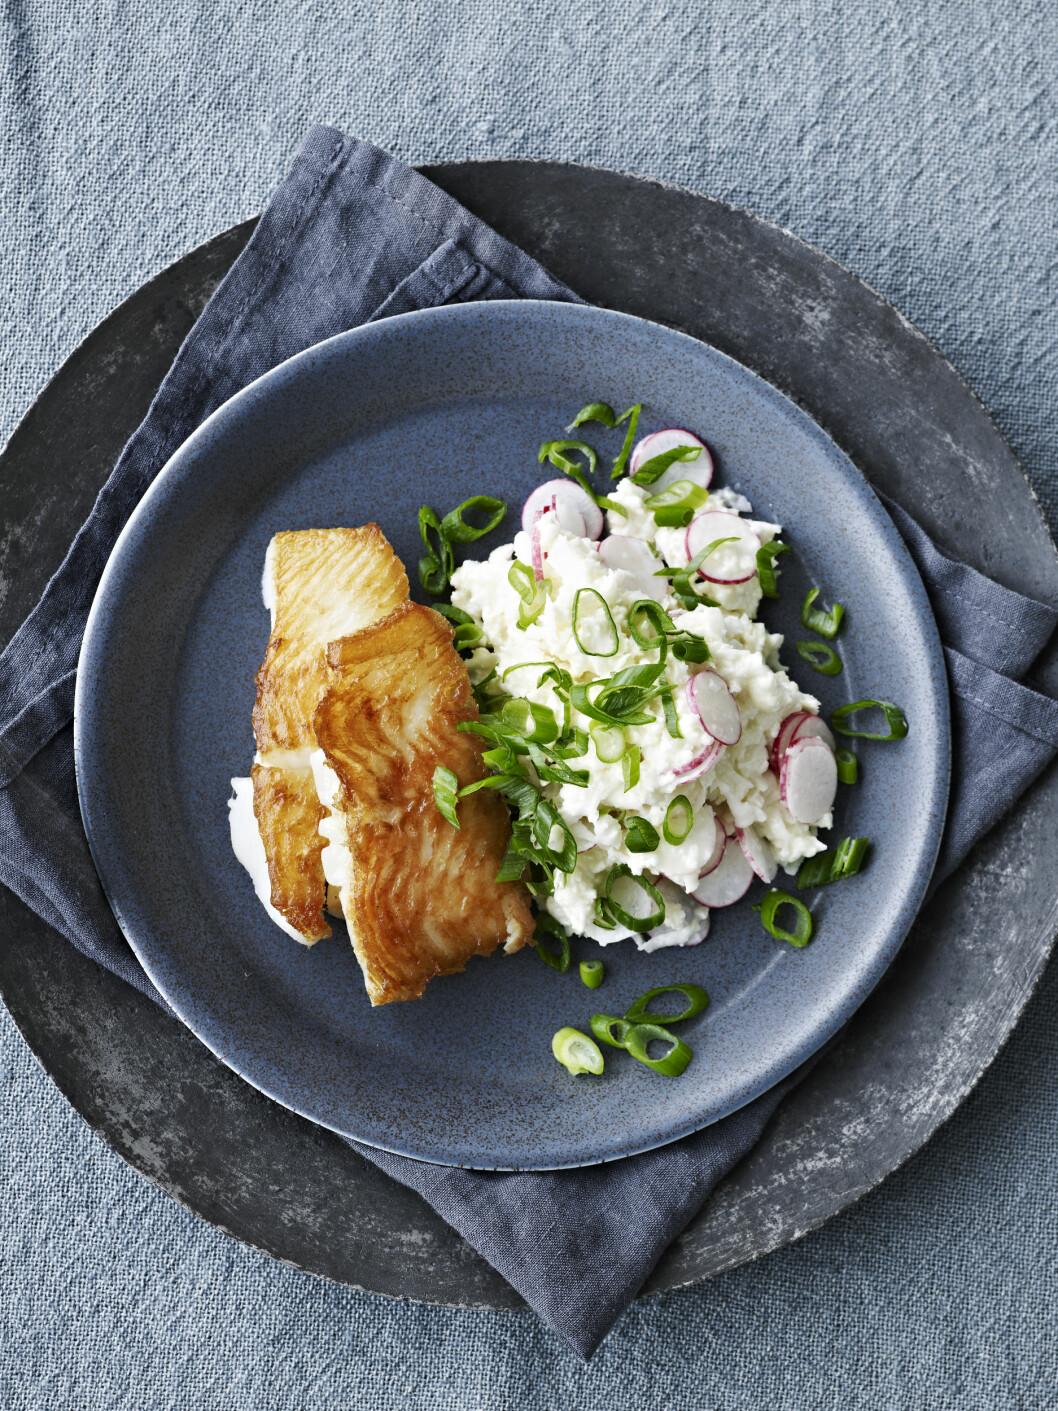 KVEITE: Prøv denne deilige fiskeretten med herlig salat Foto: All Over Press